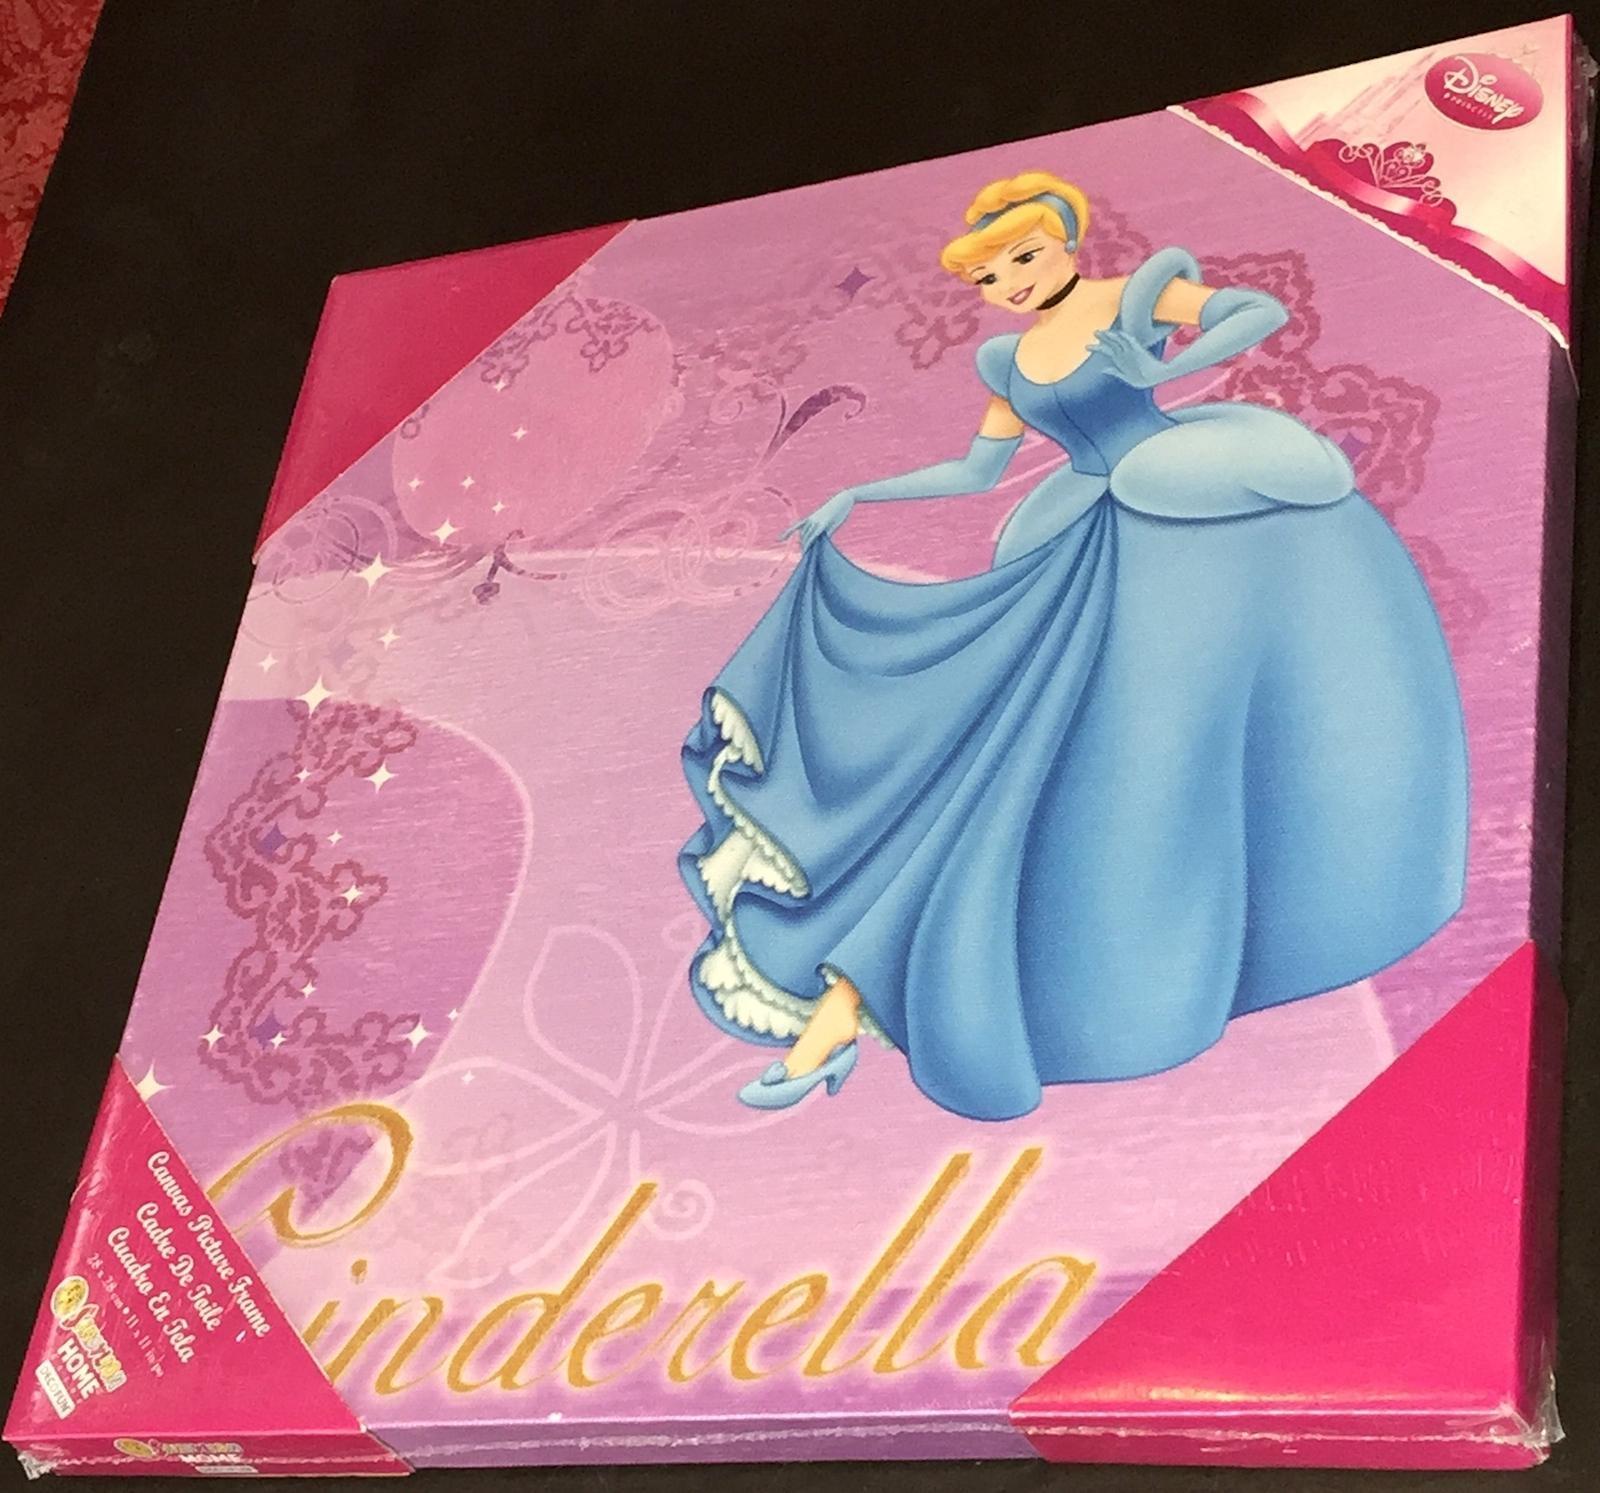 Disney's Princess Cinderella Decorative Wall Art Canvas Pertaining To Princess Canvas Wall Art (View 12 of 20)